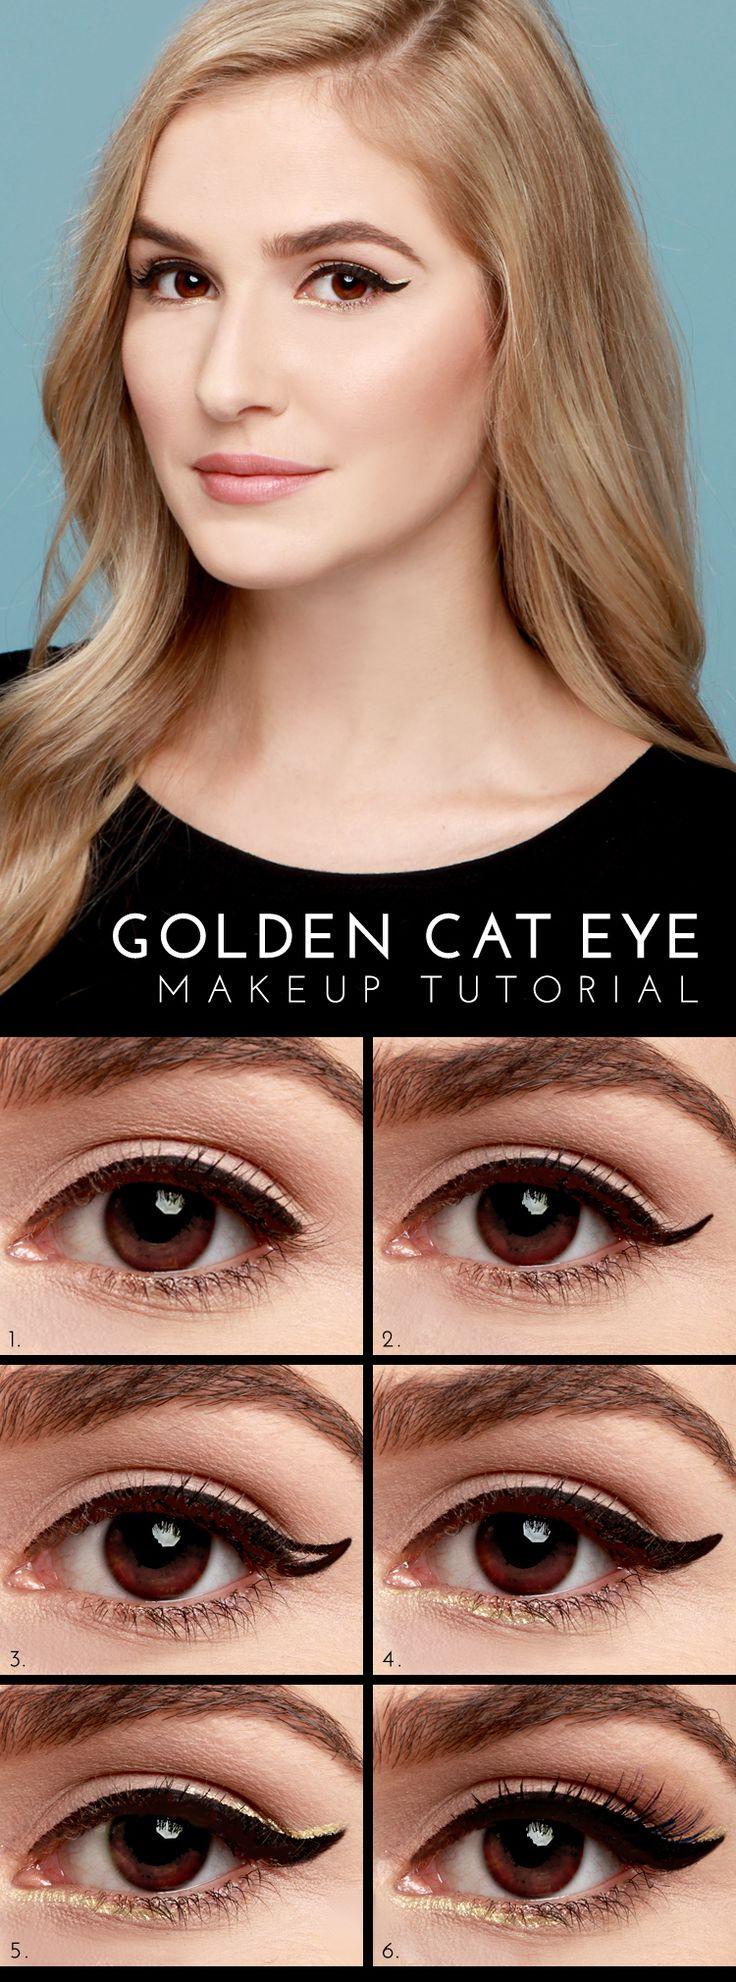 Lulus.com: Golden Cat Eye Tutorial